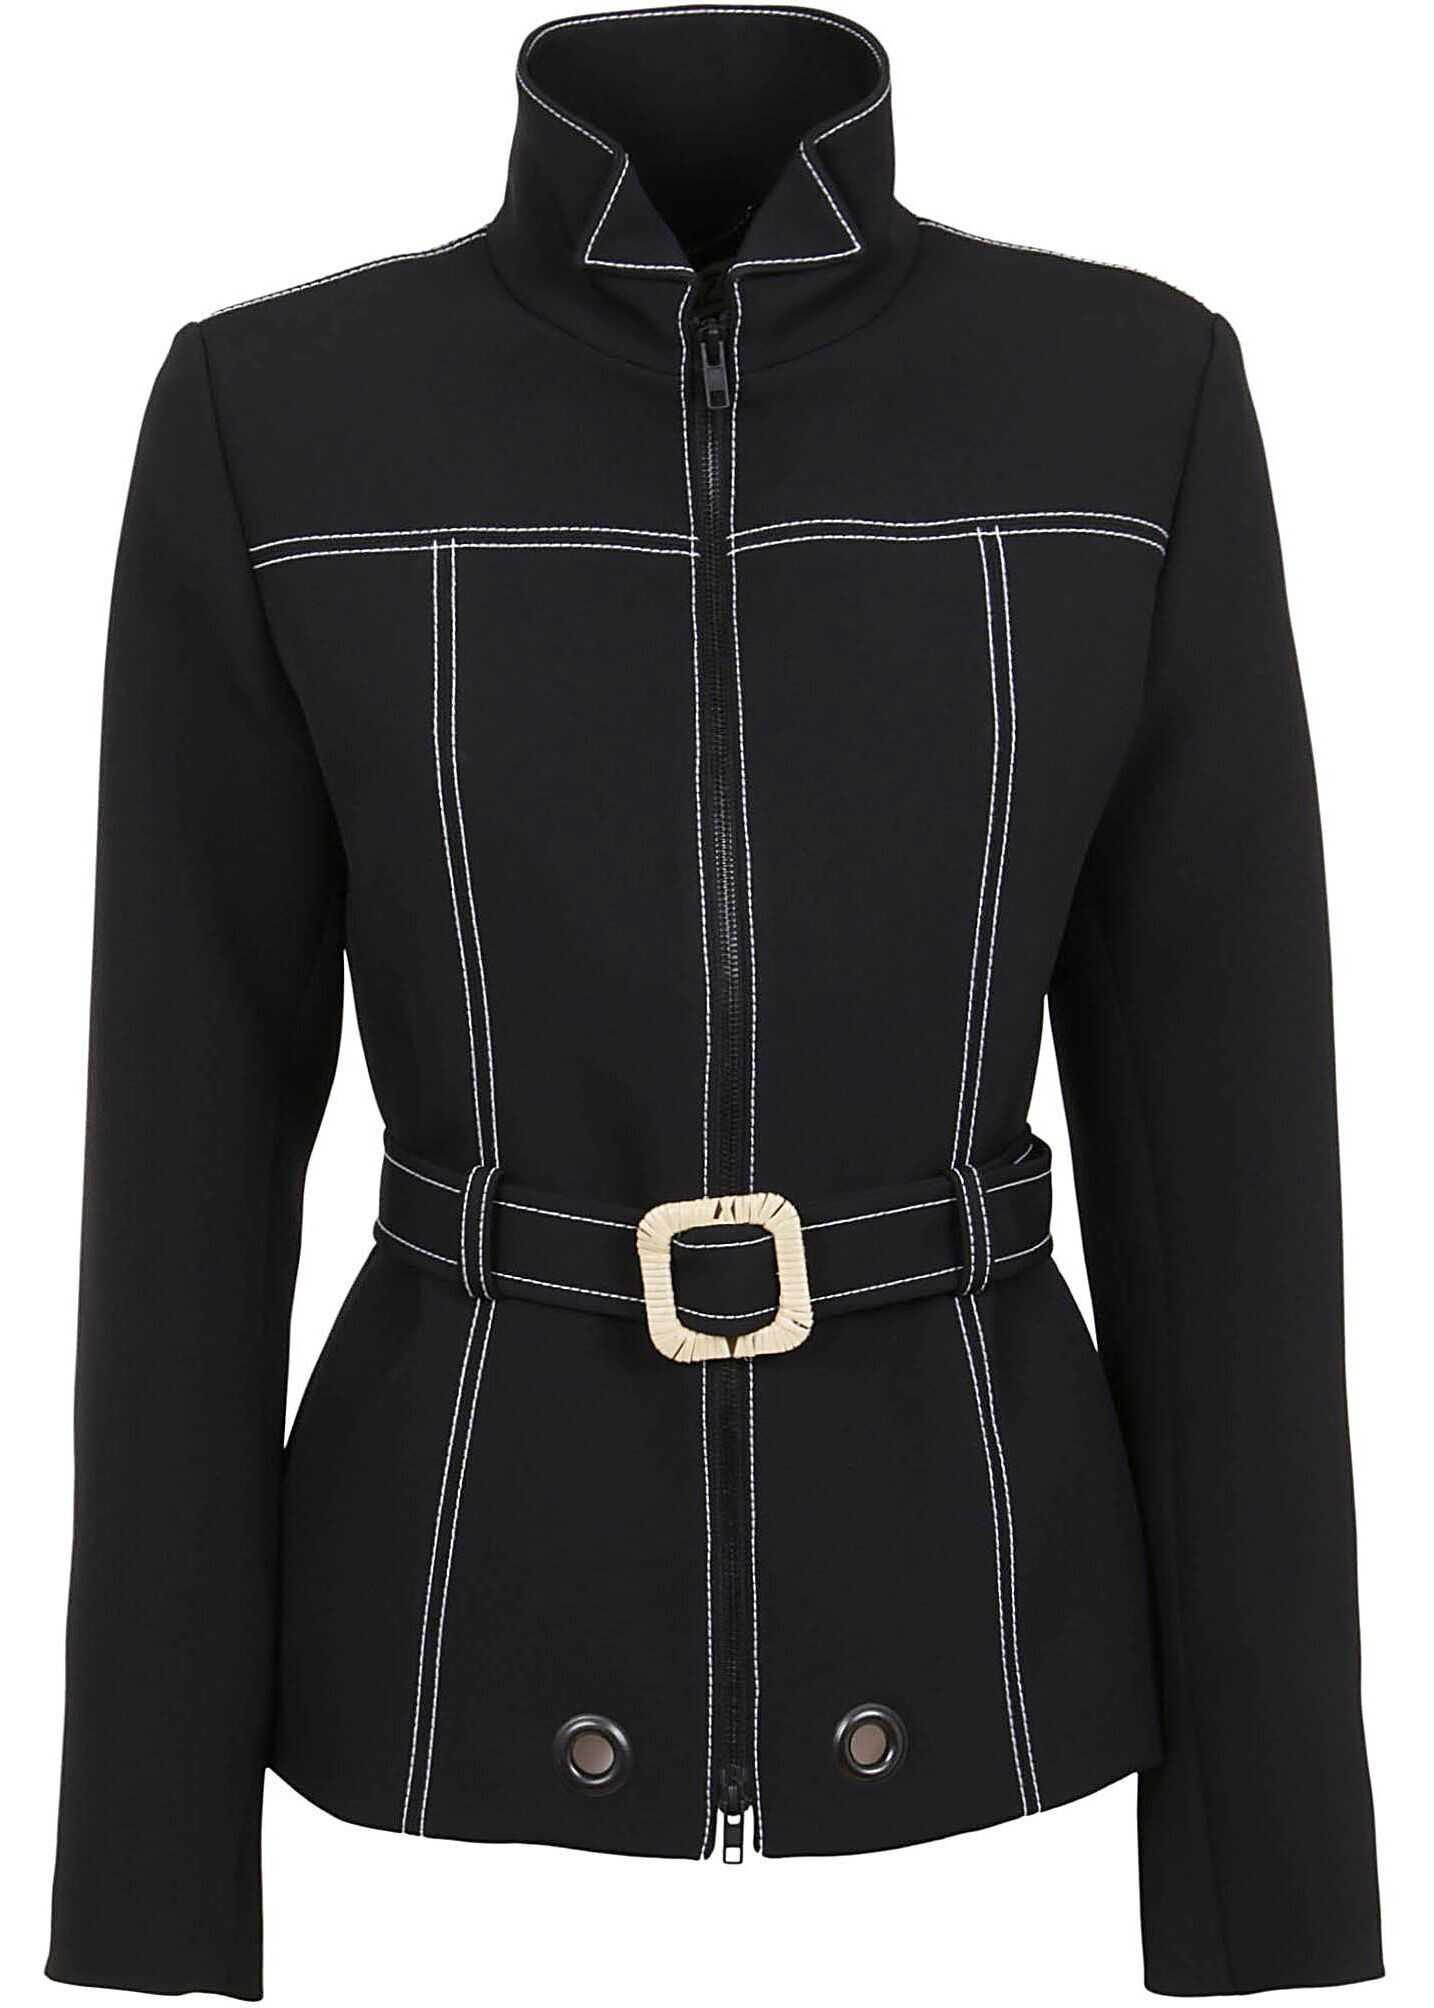 Kenzo Polyester Jacket BLACK